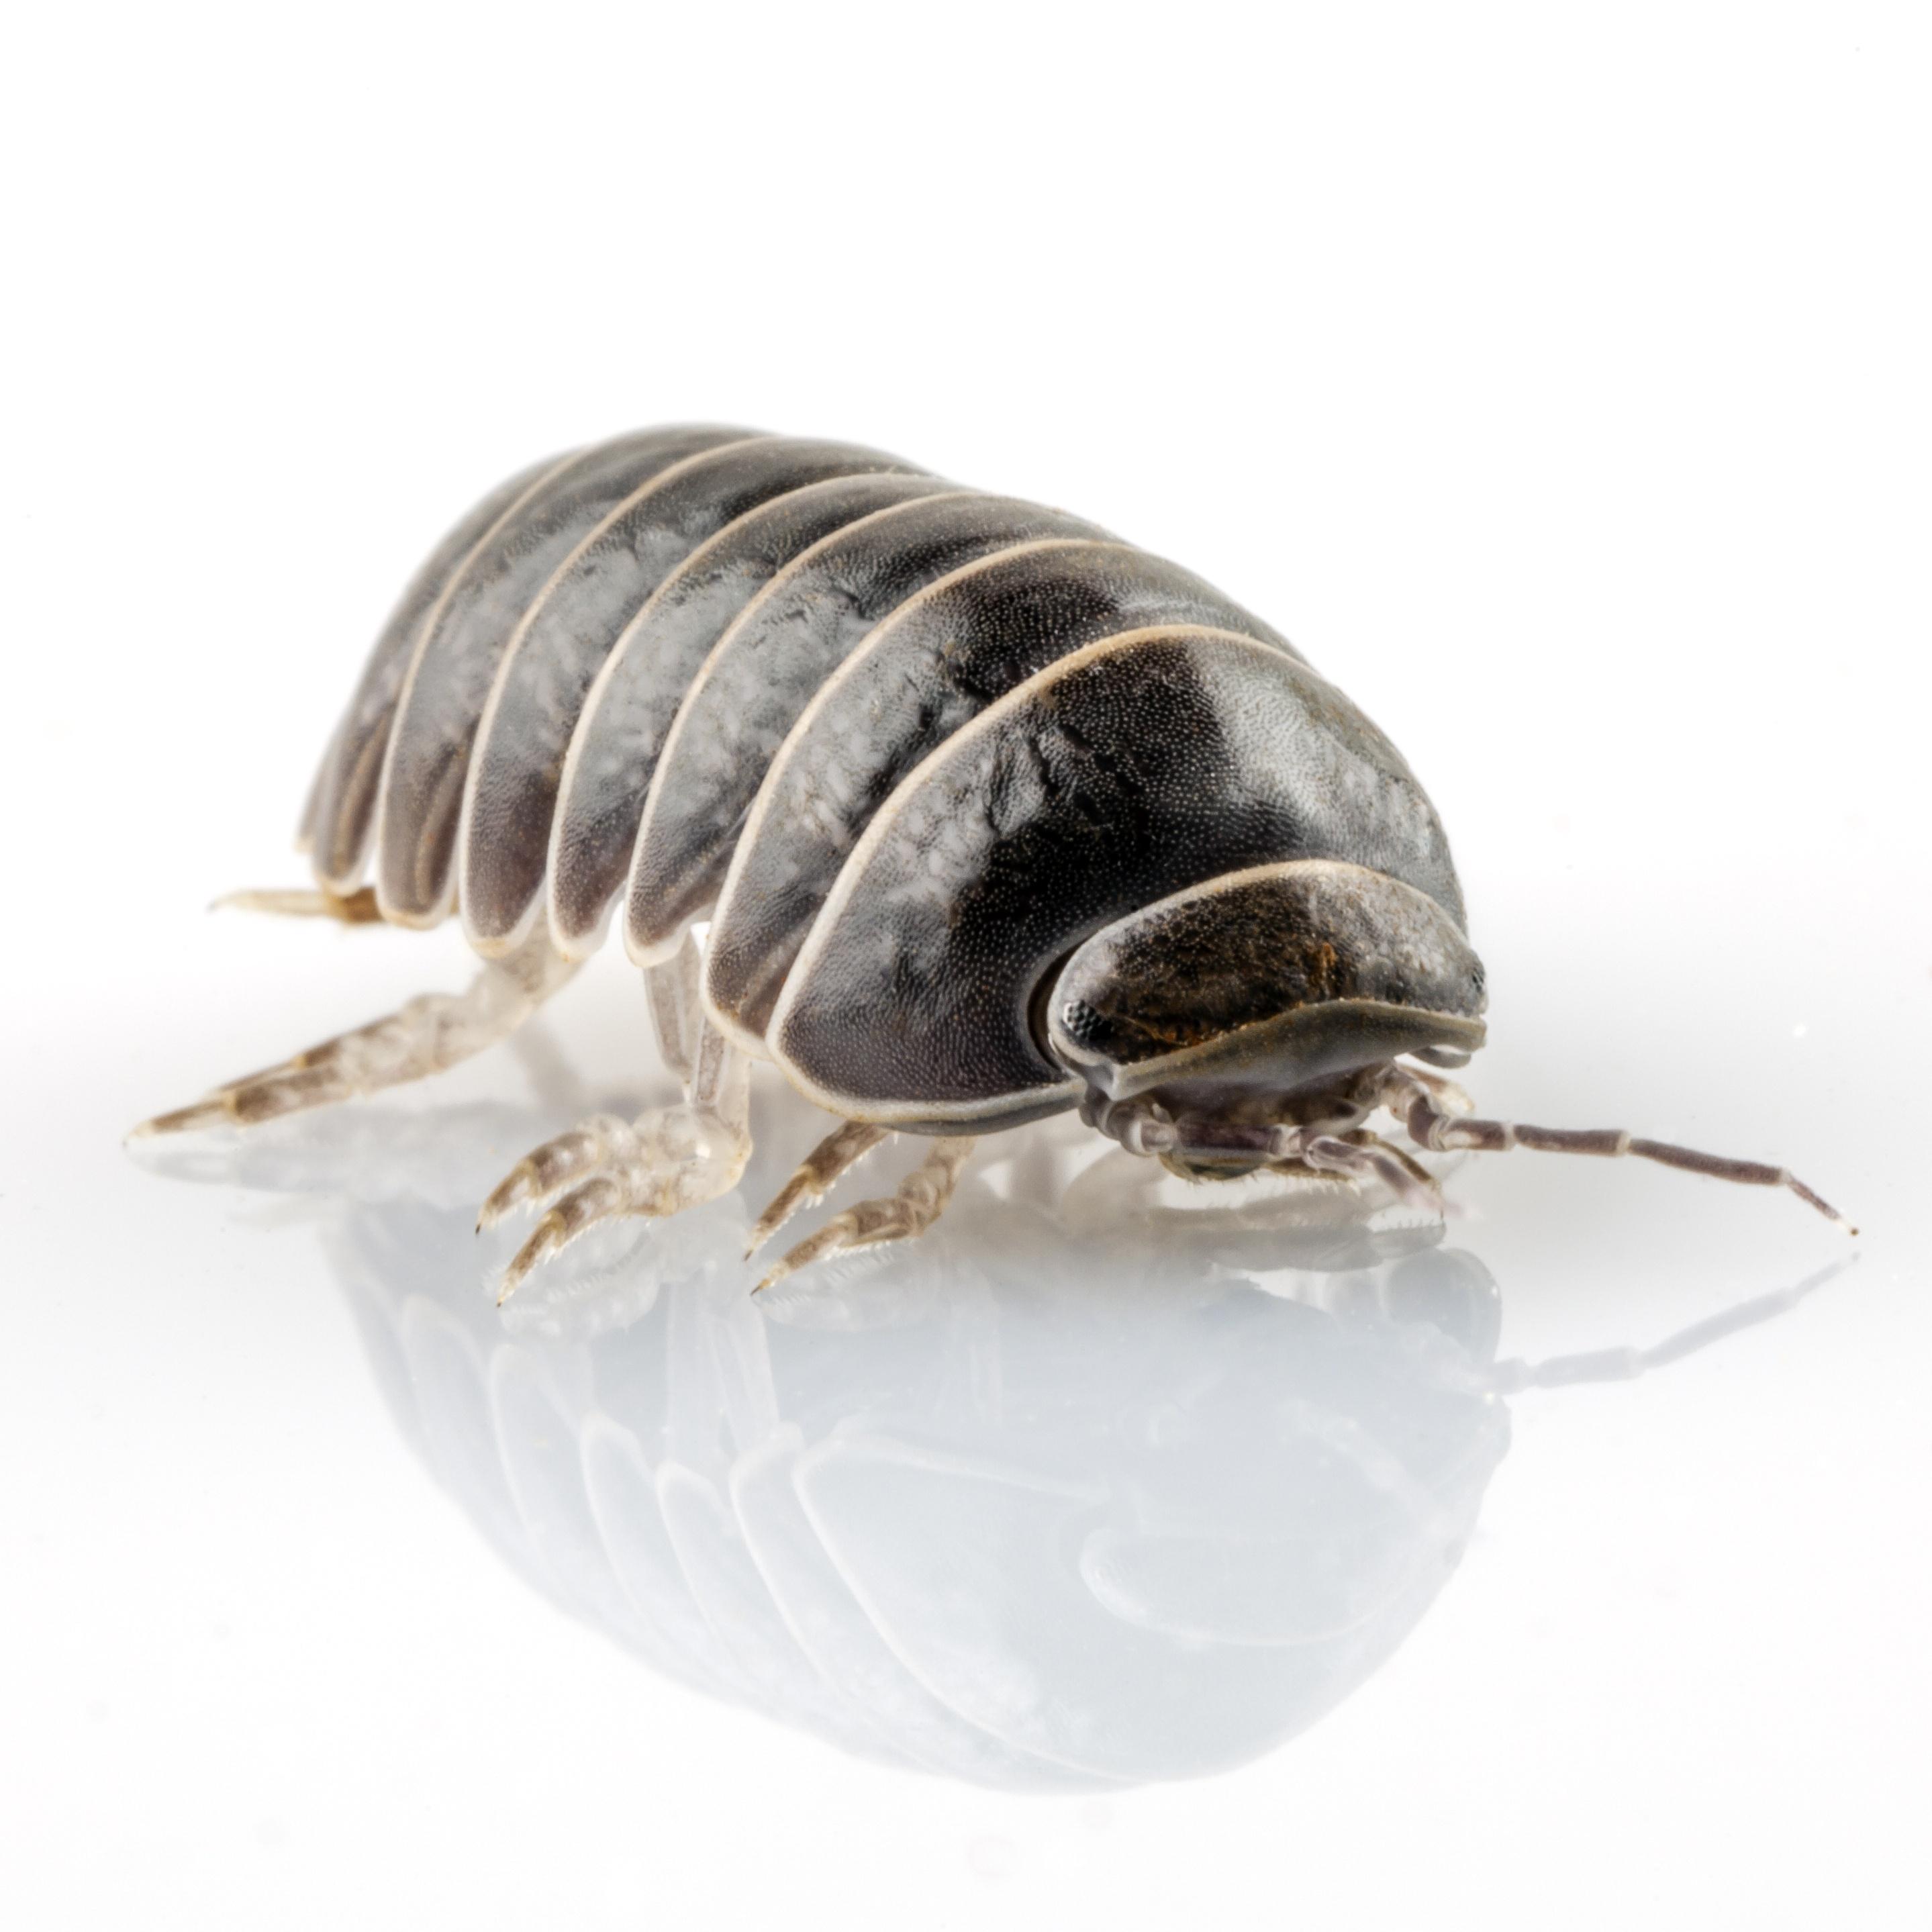 pill bug.jpg